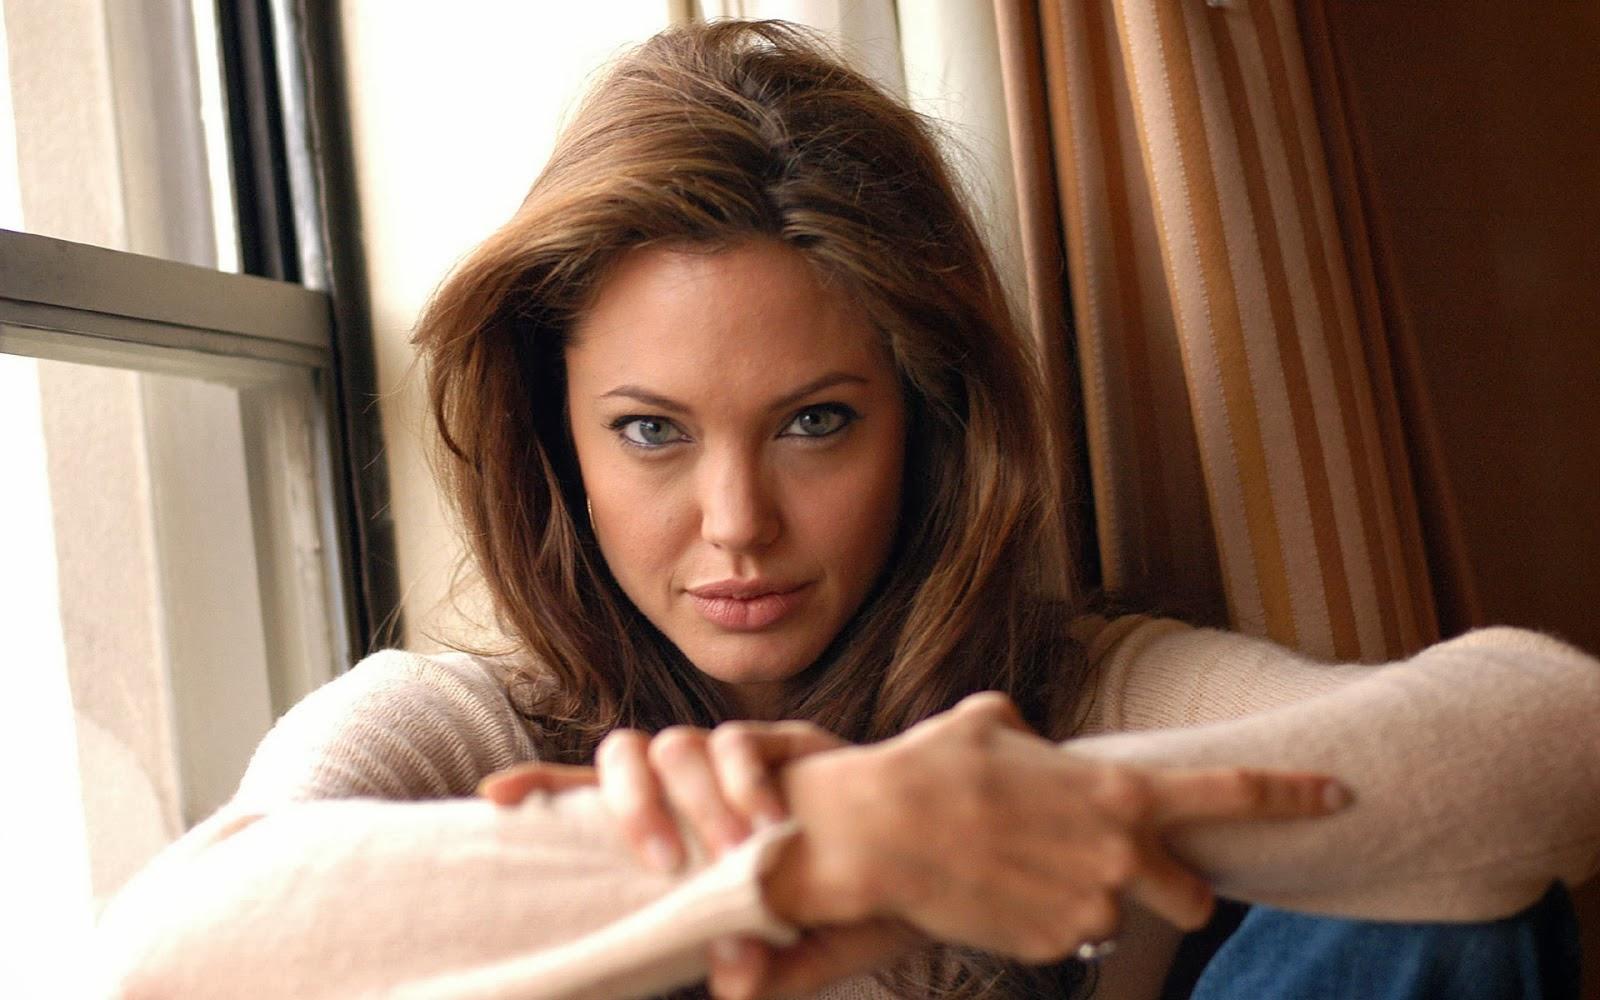 Angelina Jolie Wallpaper HD, imagens Pics - Papéis de